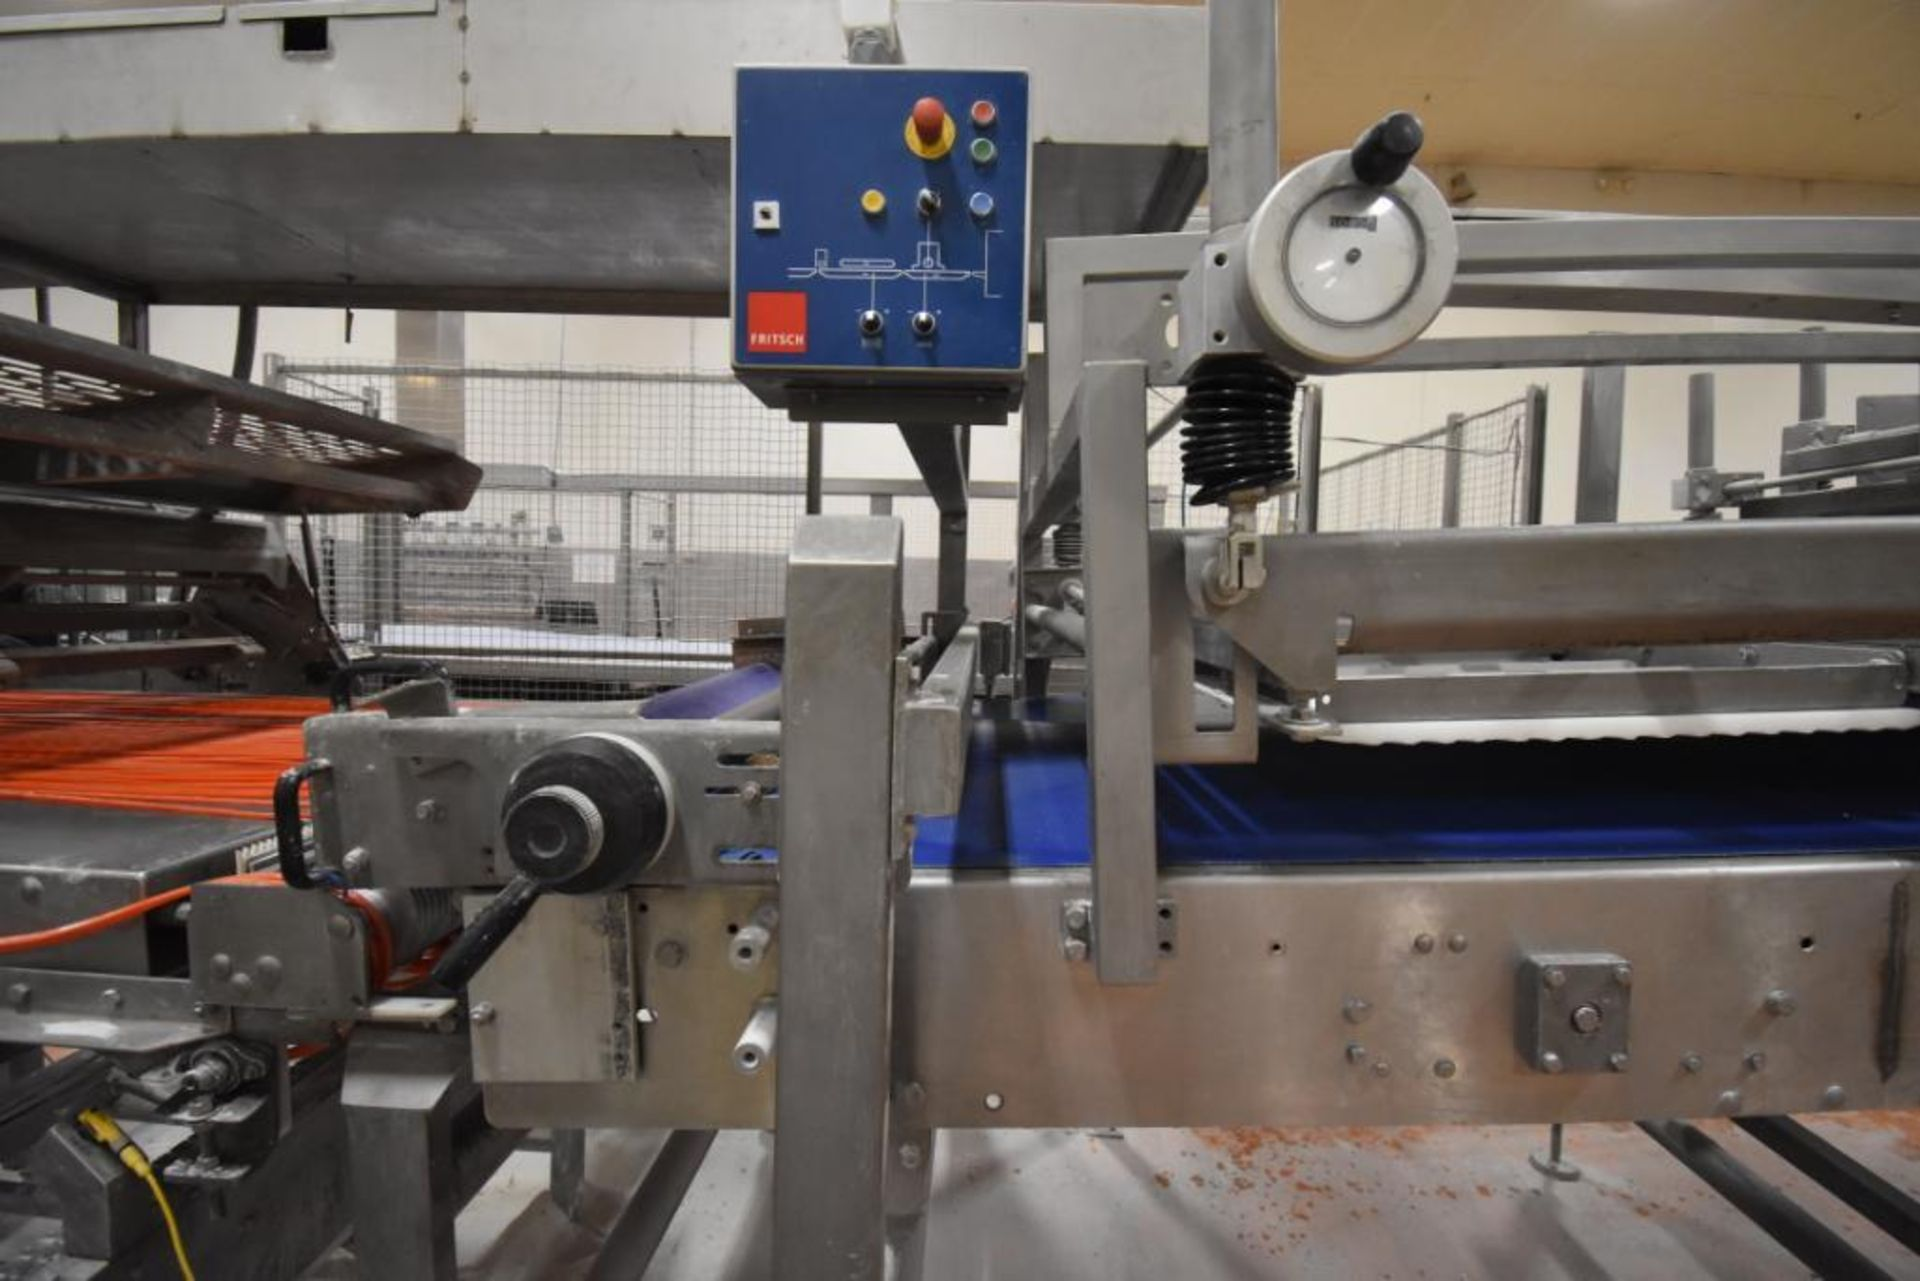 2007 Fritsch Laminator 3000 dough line - Image 194 of 280